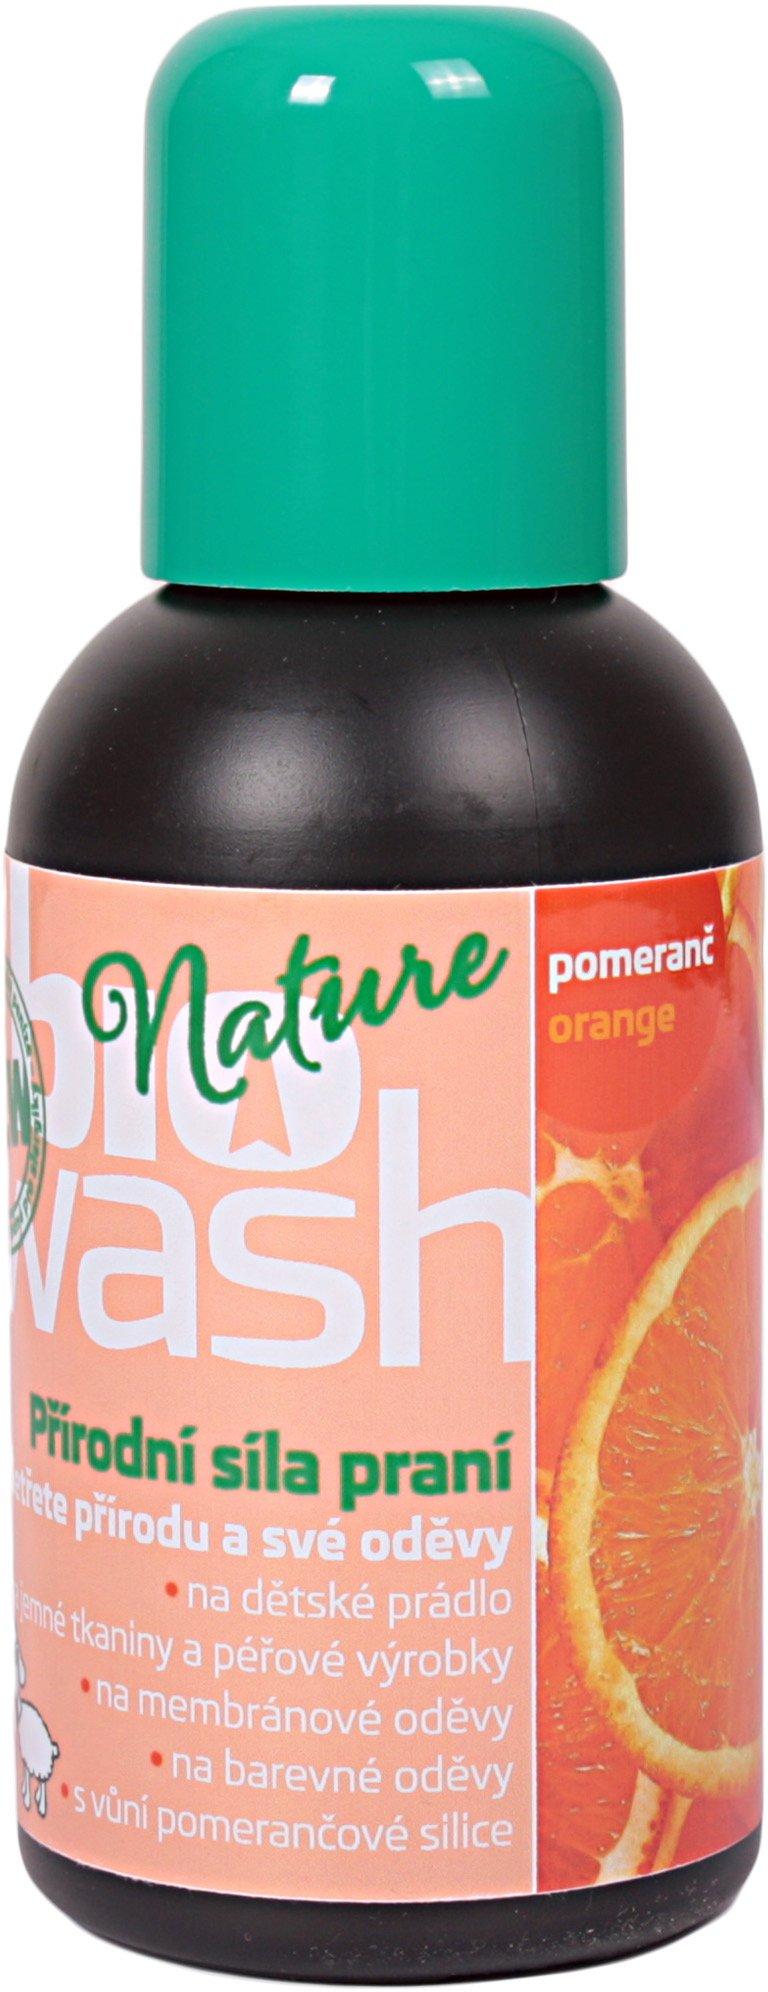 BioWash pomeranč, 250 ml